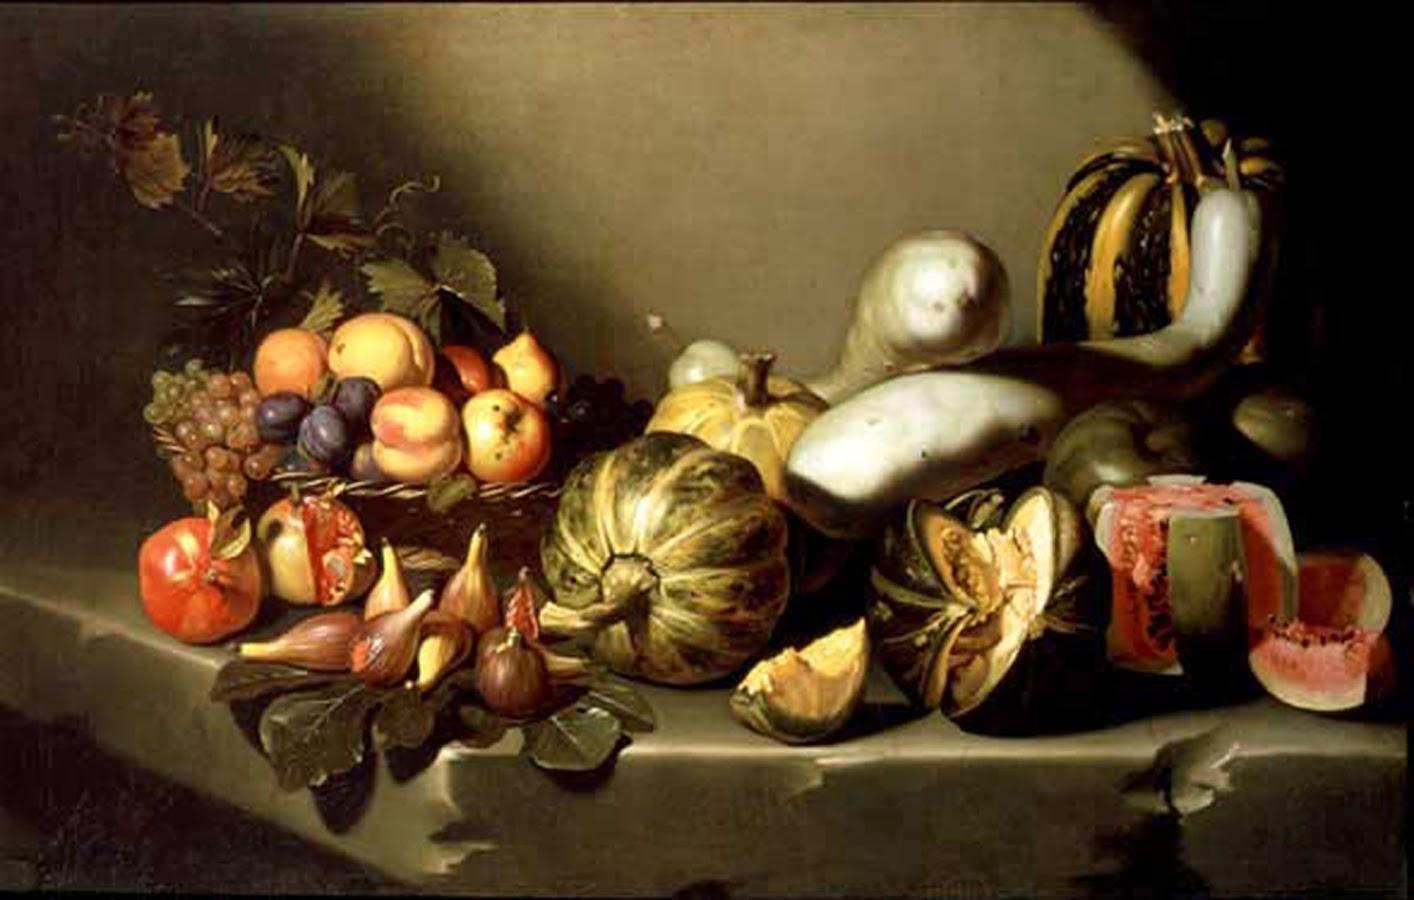 Figura 1. Michelangelo Caravaggio. Still life with fruit. 1601-1605.